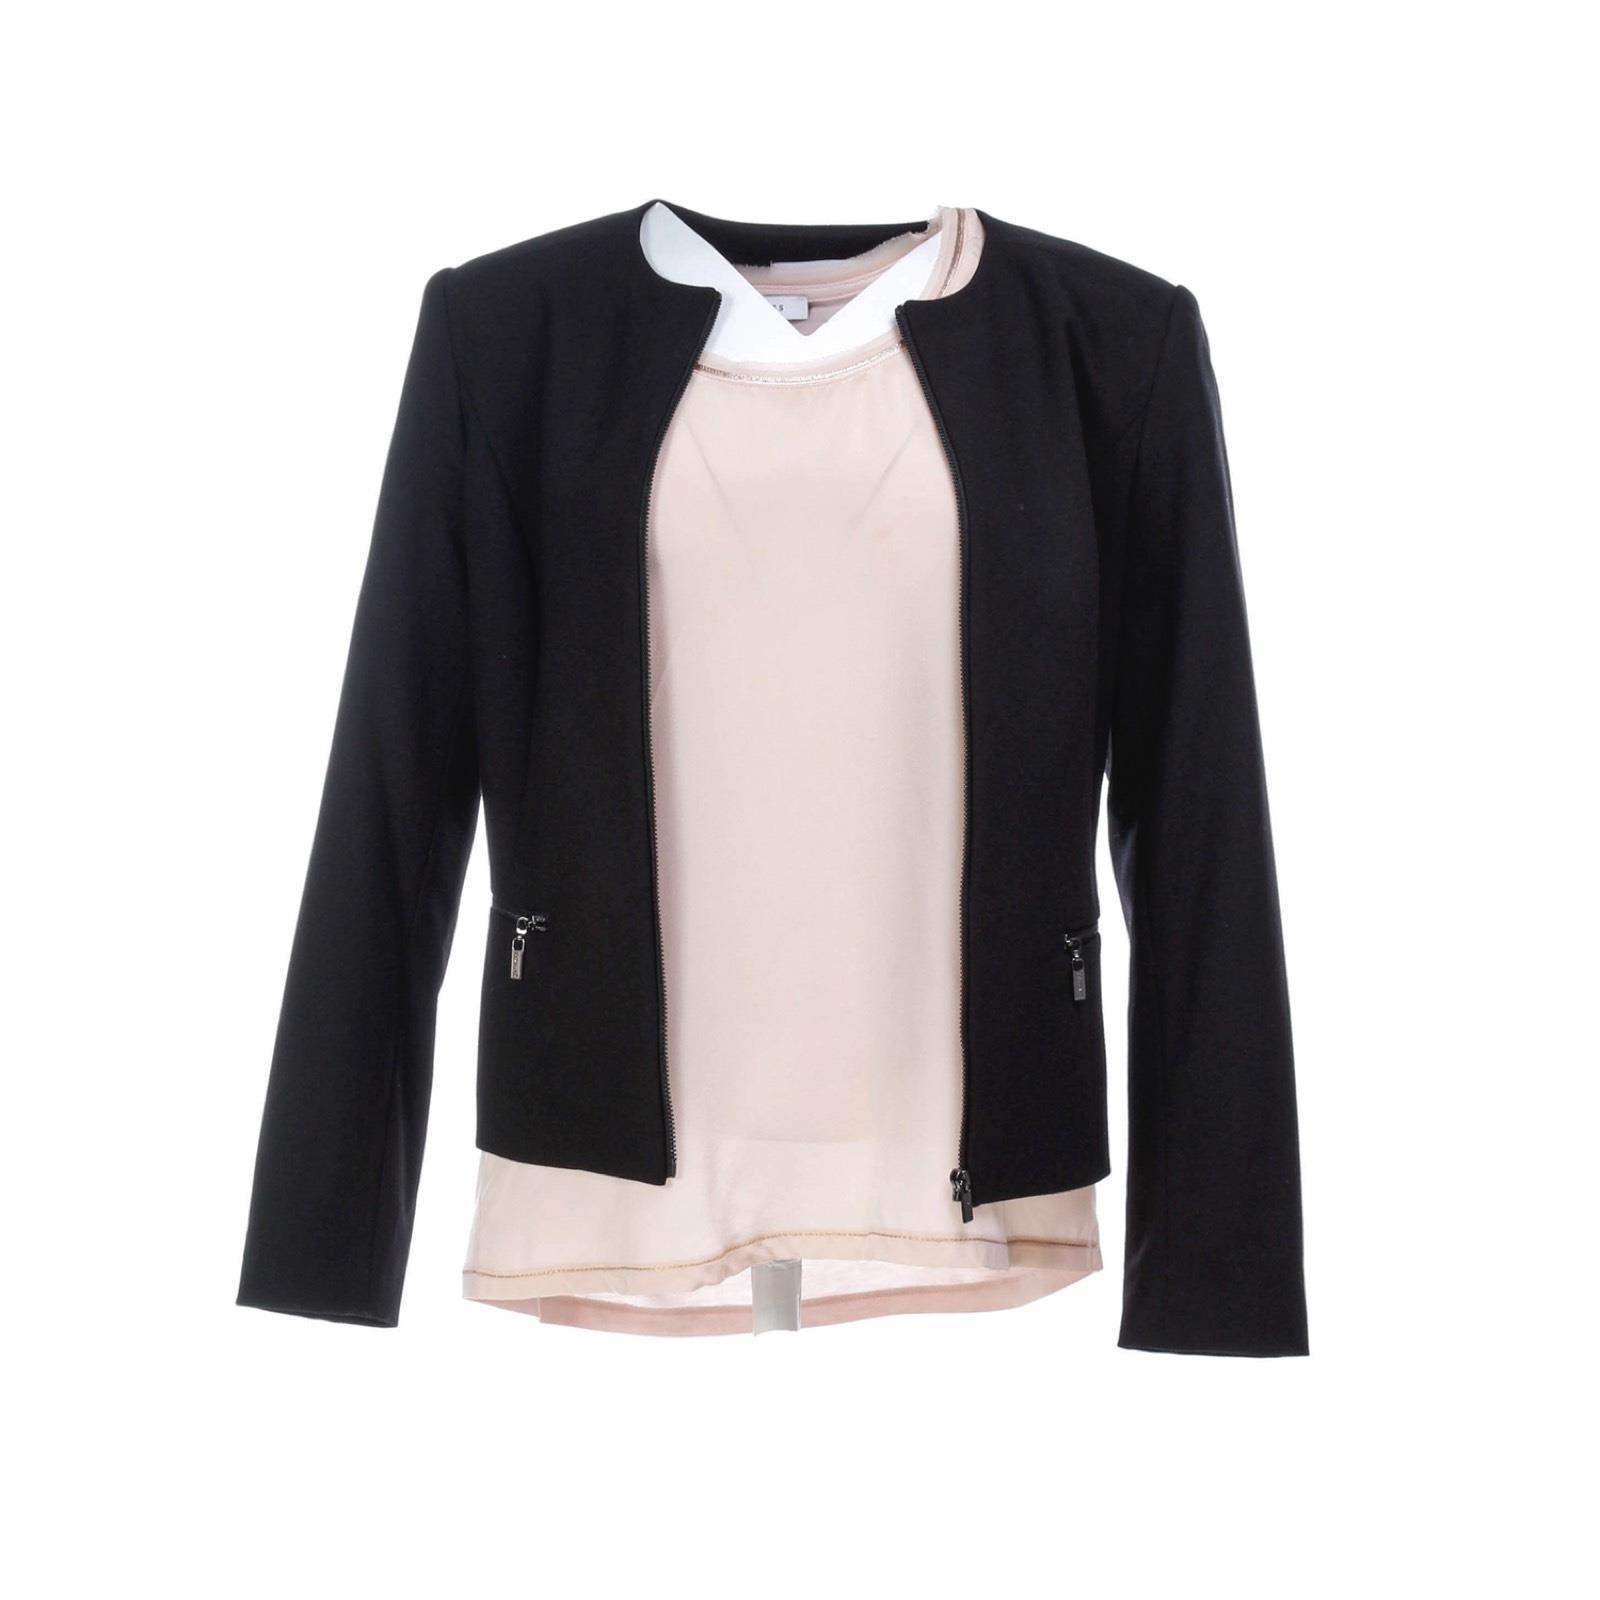 OITNB-Tamika-Susan-Heyward-Screen-Worn-Jacket-amp-Reiss-Shirt-Ep-707